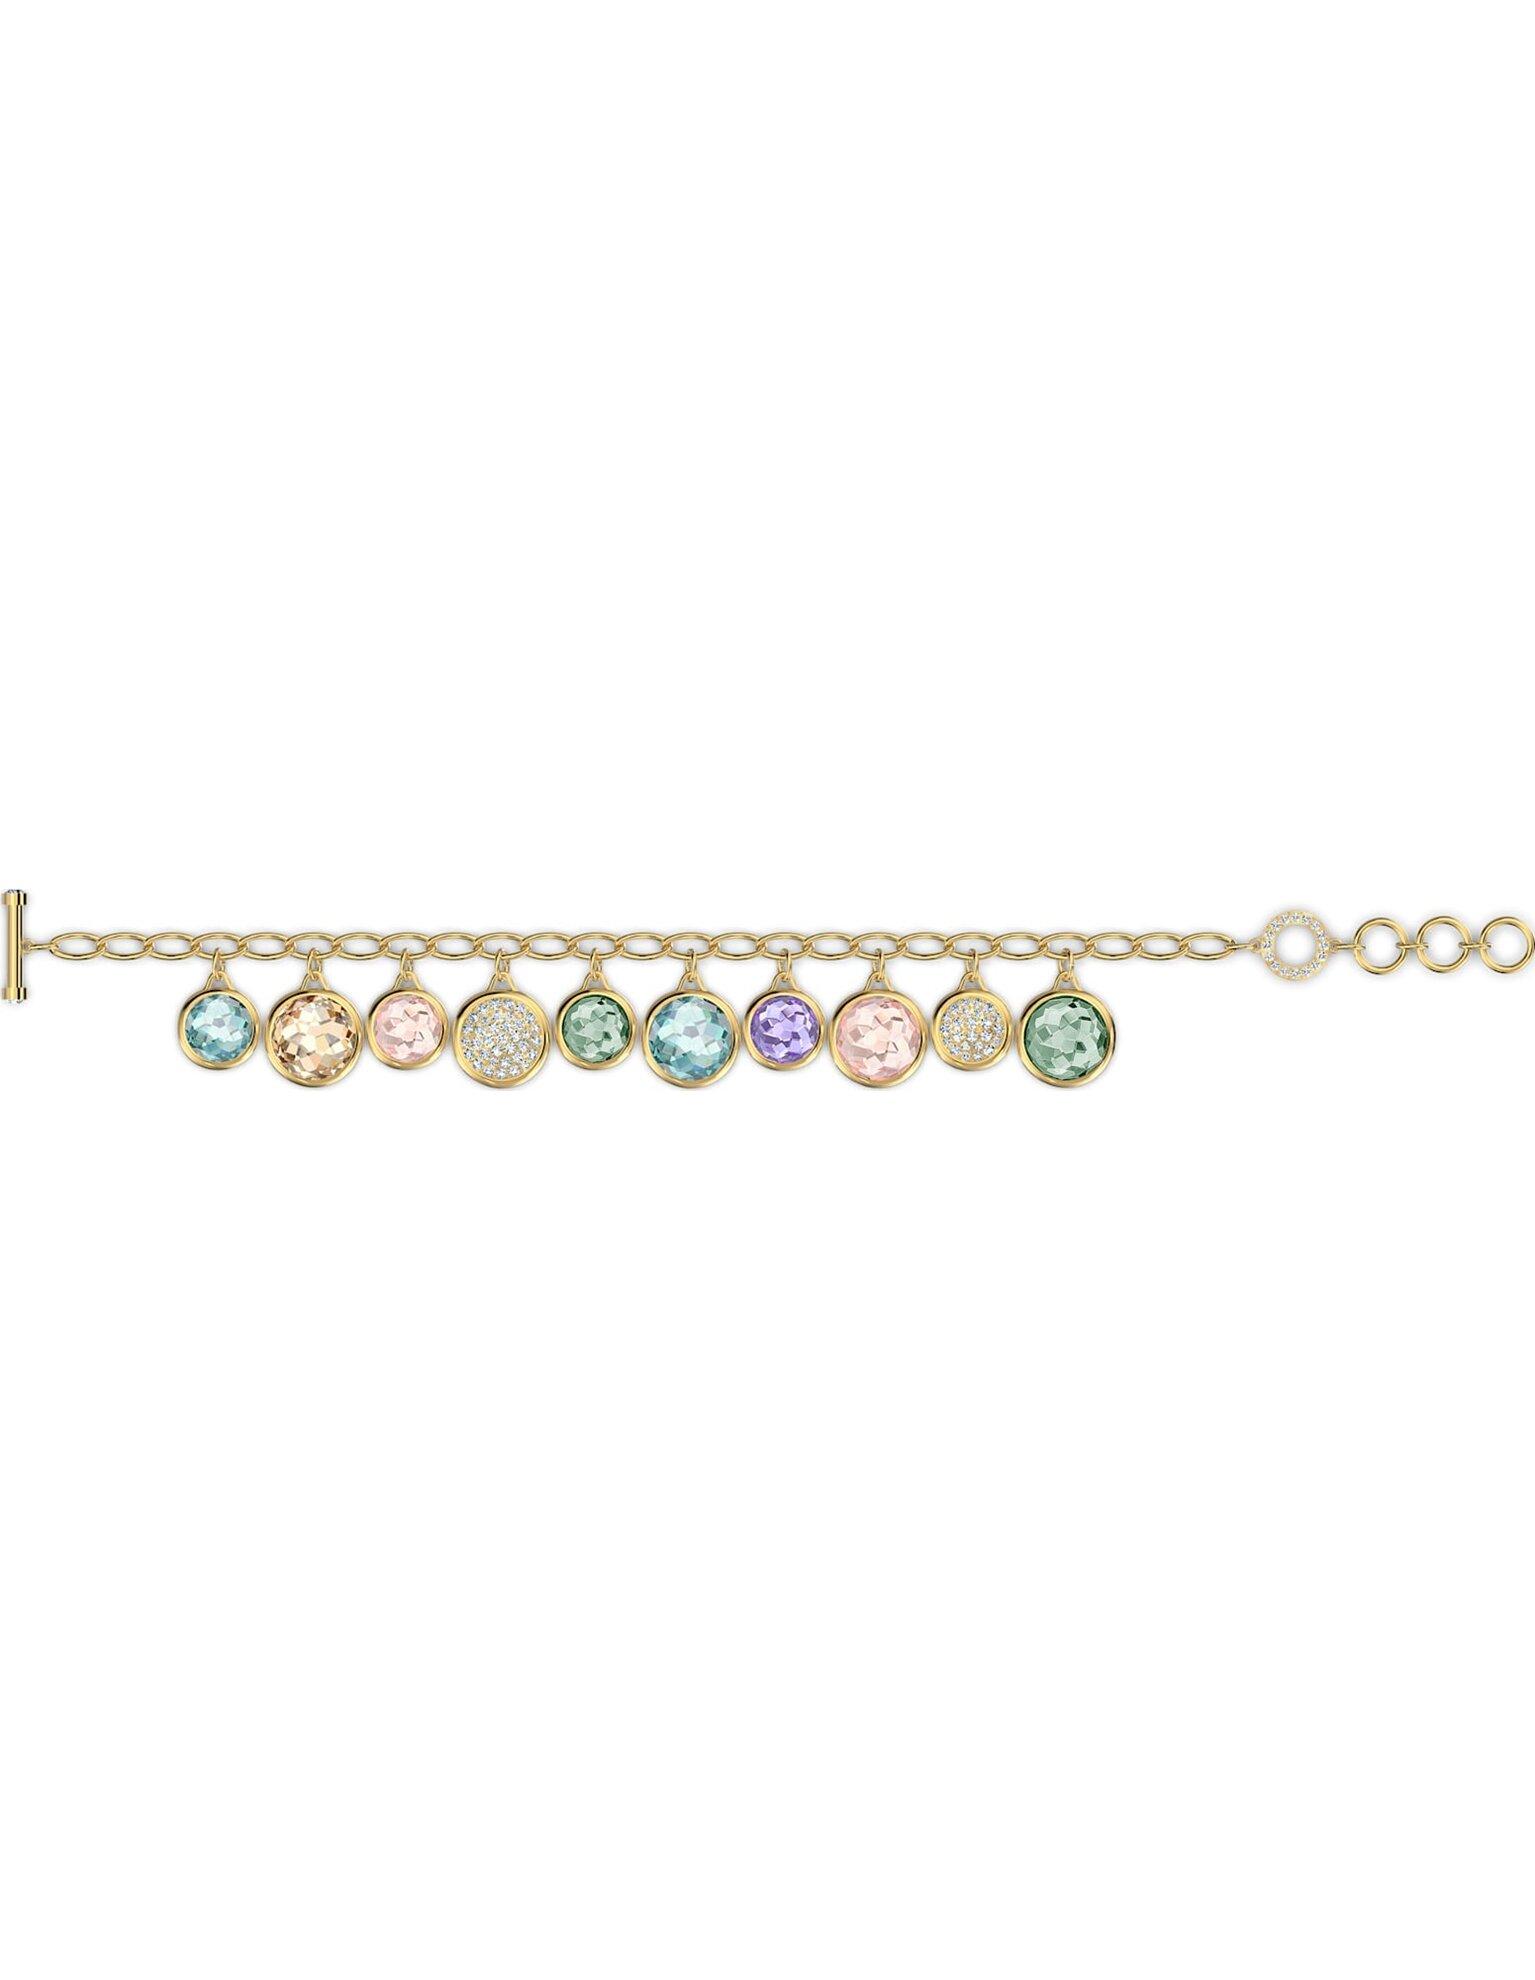 Picture of Tahlia Elements Bileklik, Altın rengi kaplama